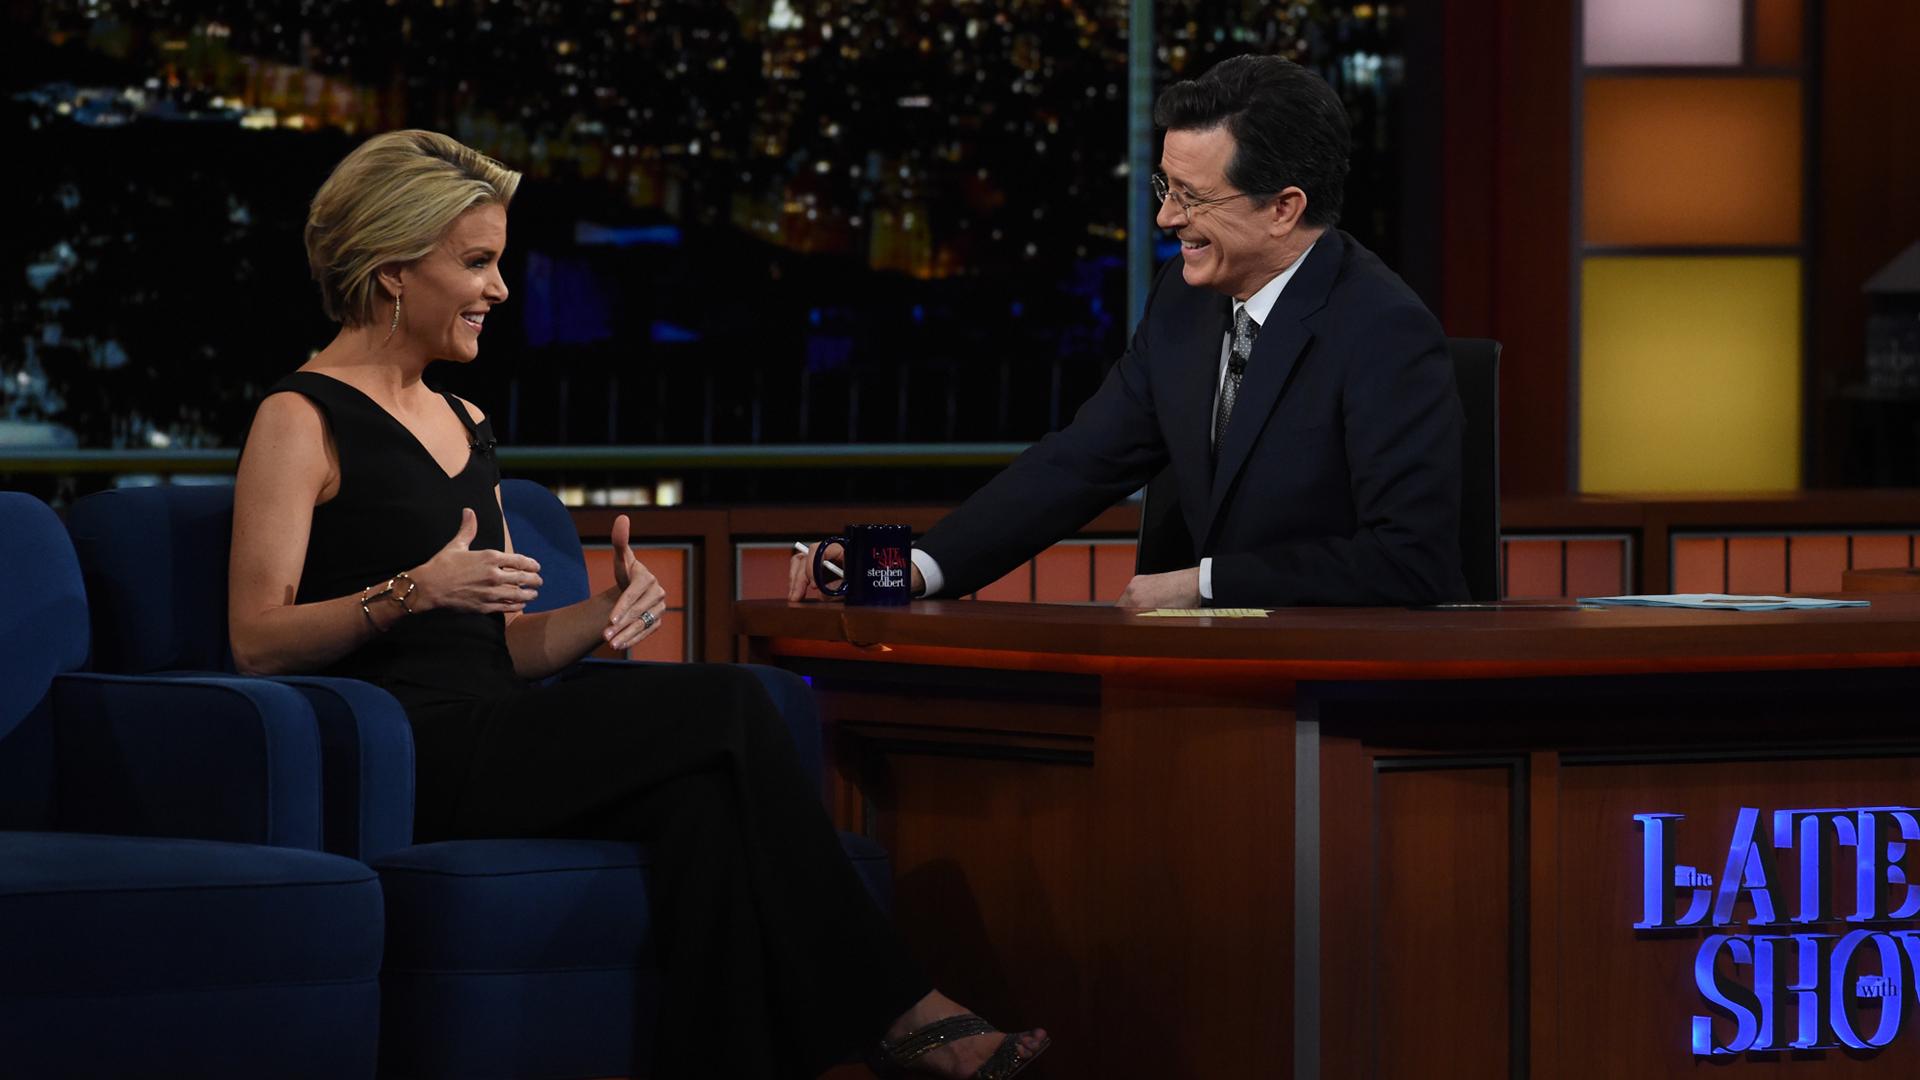 Megyn Kelly and Stephen Colbert